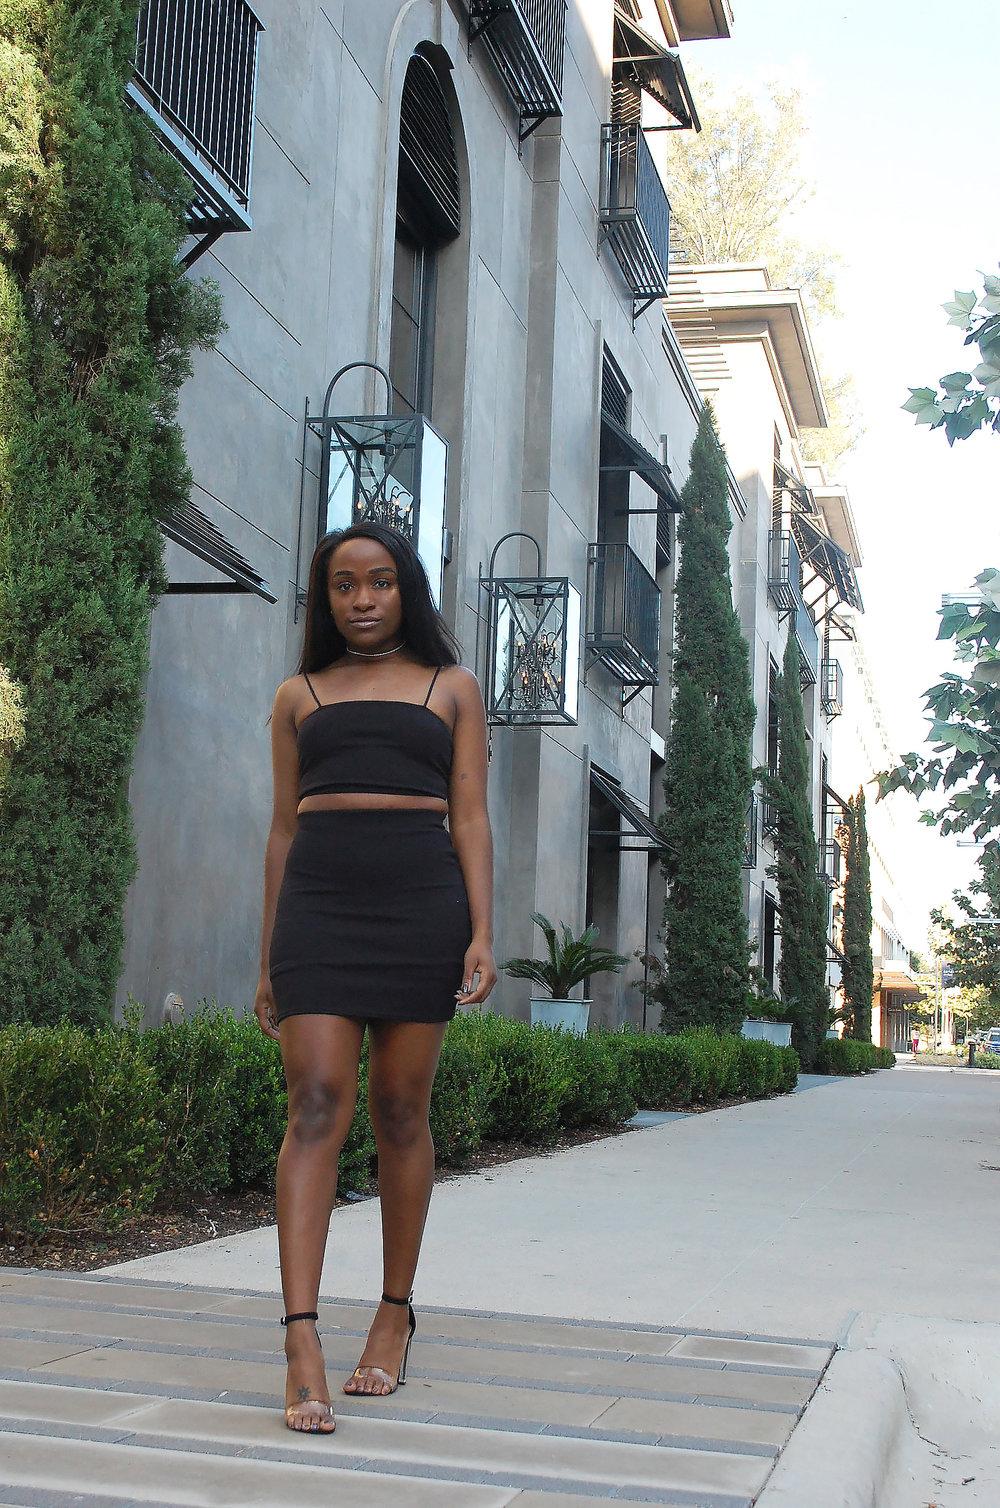 THE DEETS : Sarah Strappy Crop & Mini Skirt Set -   Boohoo  ; Holly Lucite Block Heels -   Target  ; Feelin' Single Diamond Choker  -  Naked Wardrobe